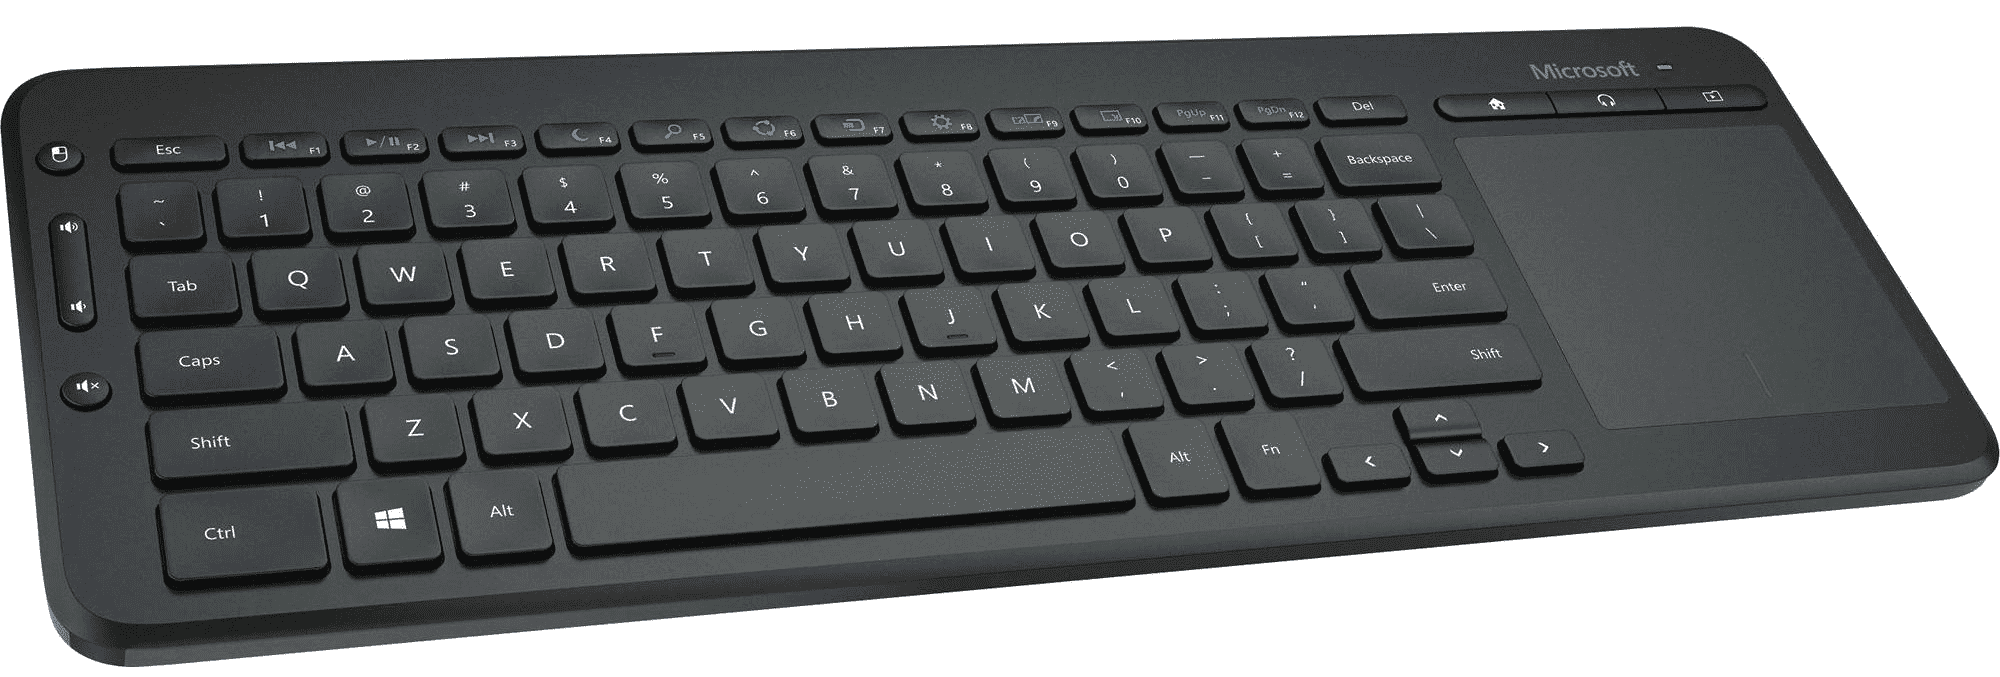 microsoftwllinone